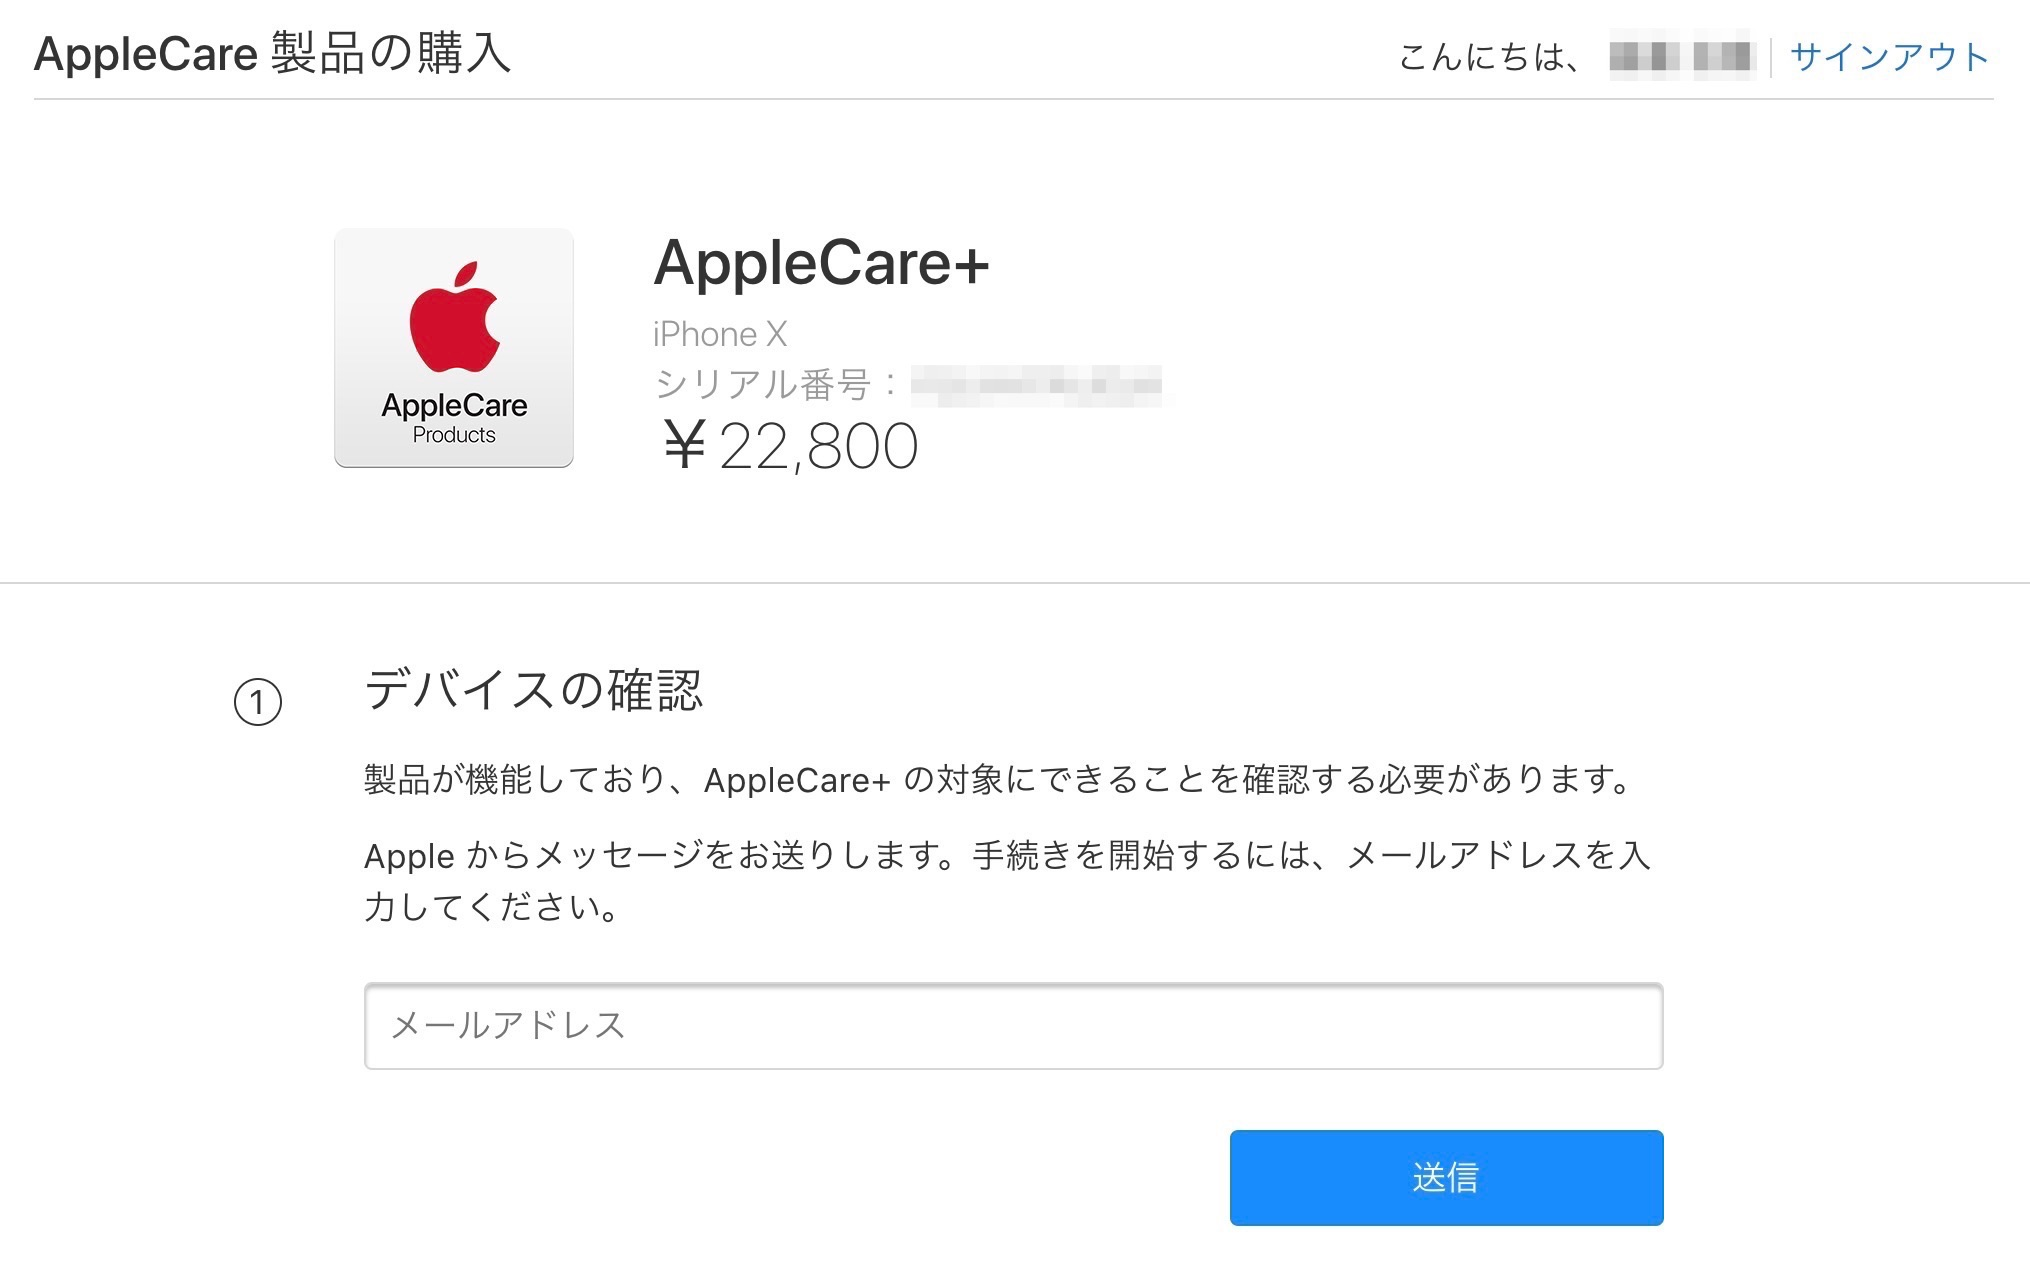 AppleCare+ デバイスの確認